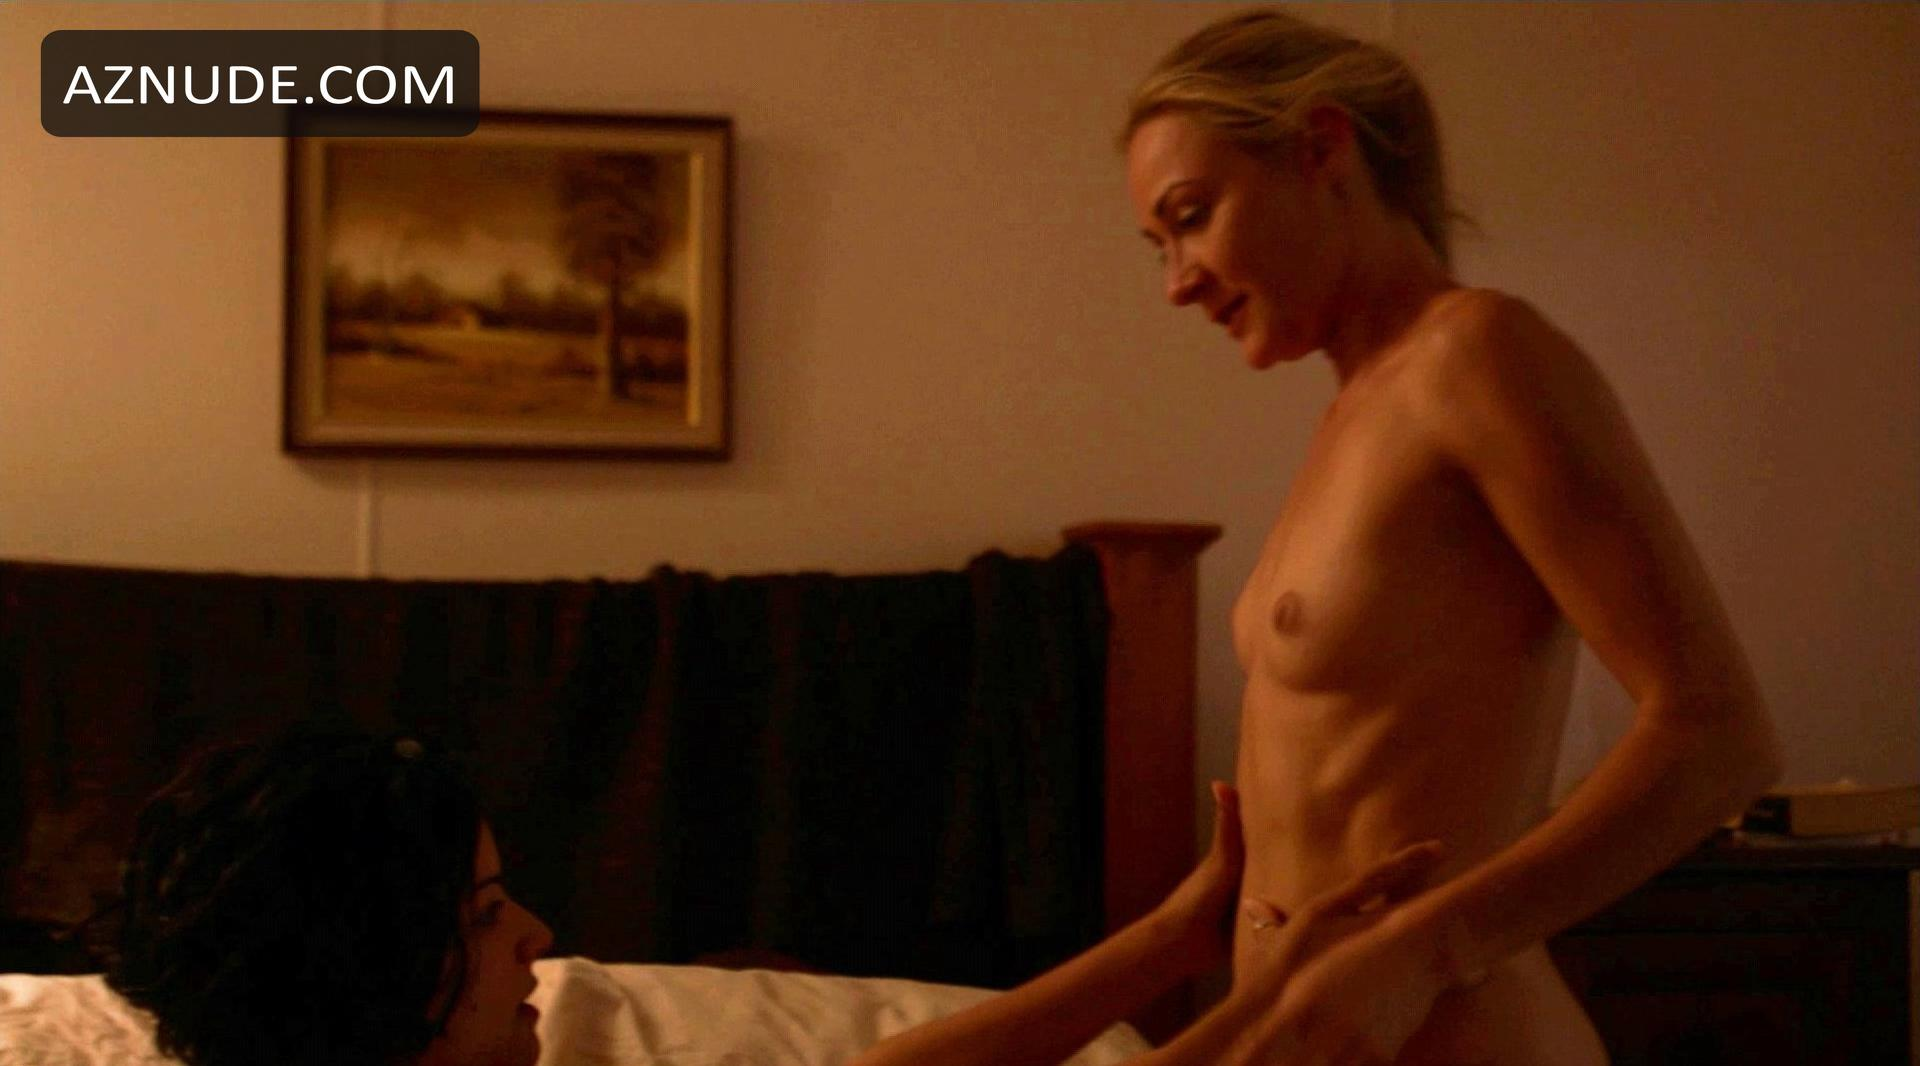 Porno Julia Billington naked (98 foto and video), Pussy, Sideboobs, Boobs, panties 2019